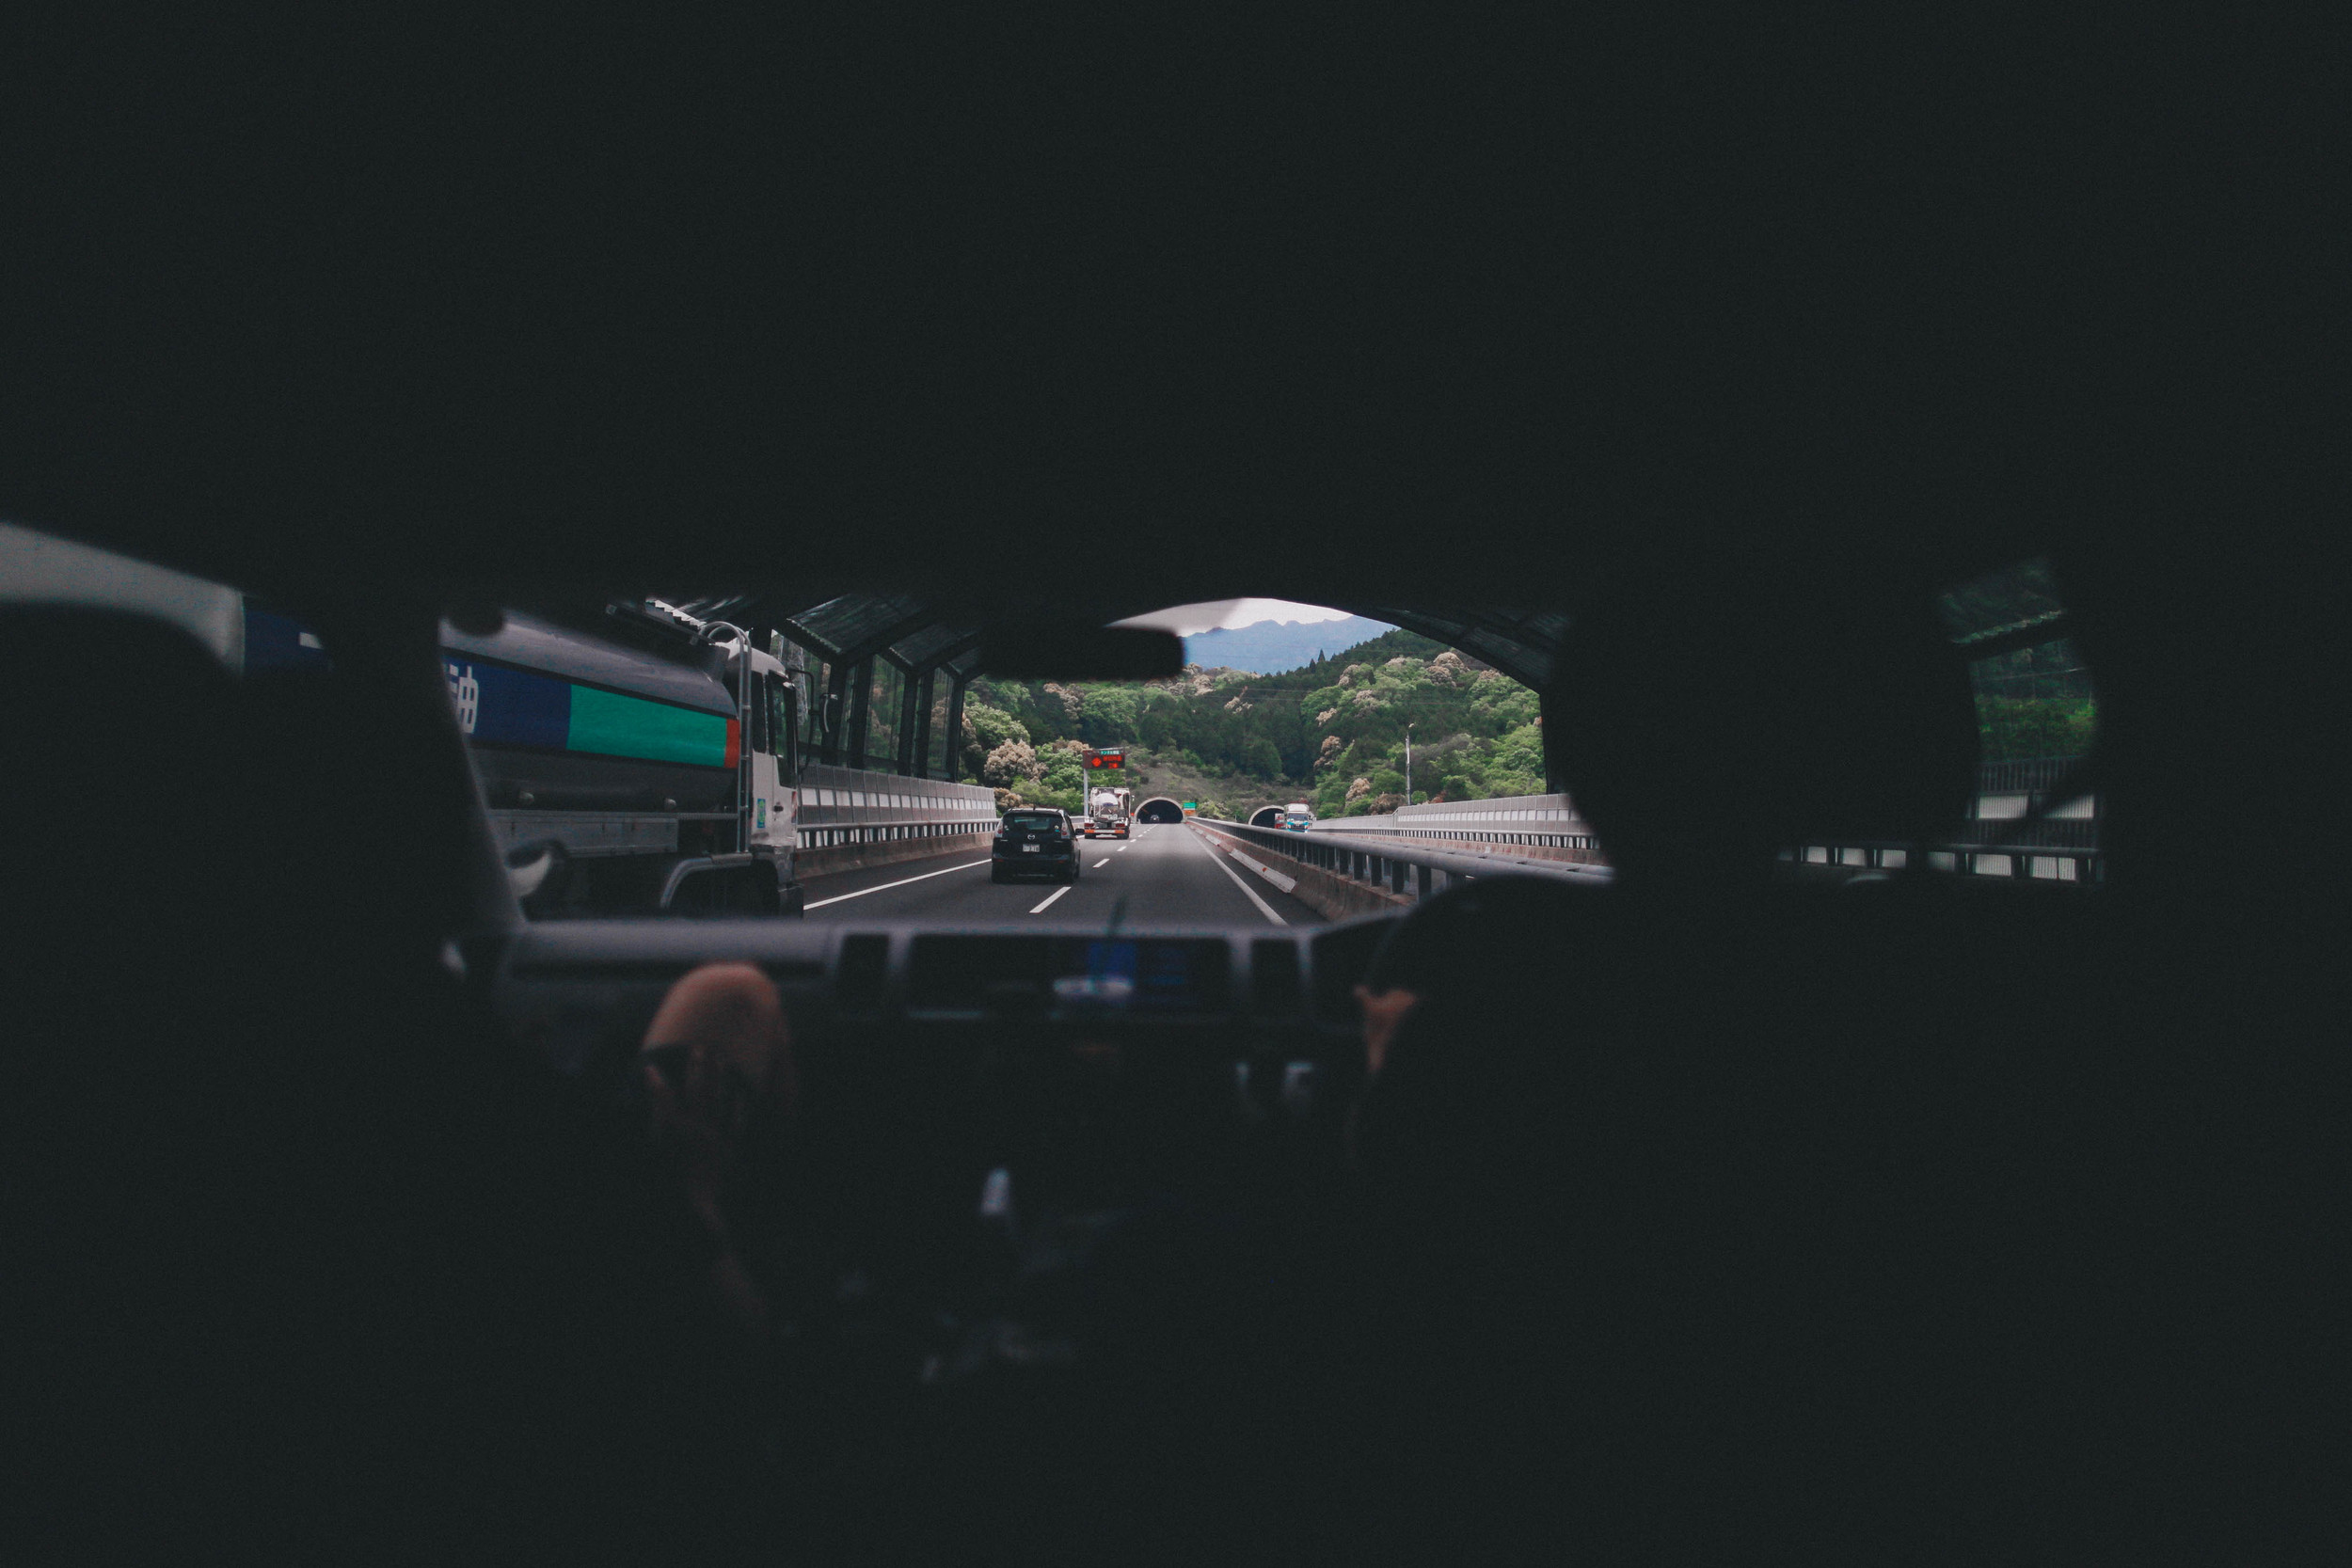 backseat-4.jpg